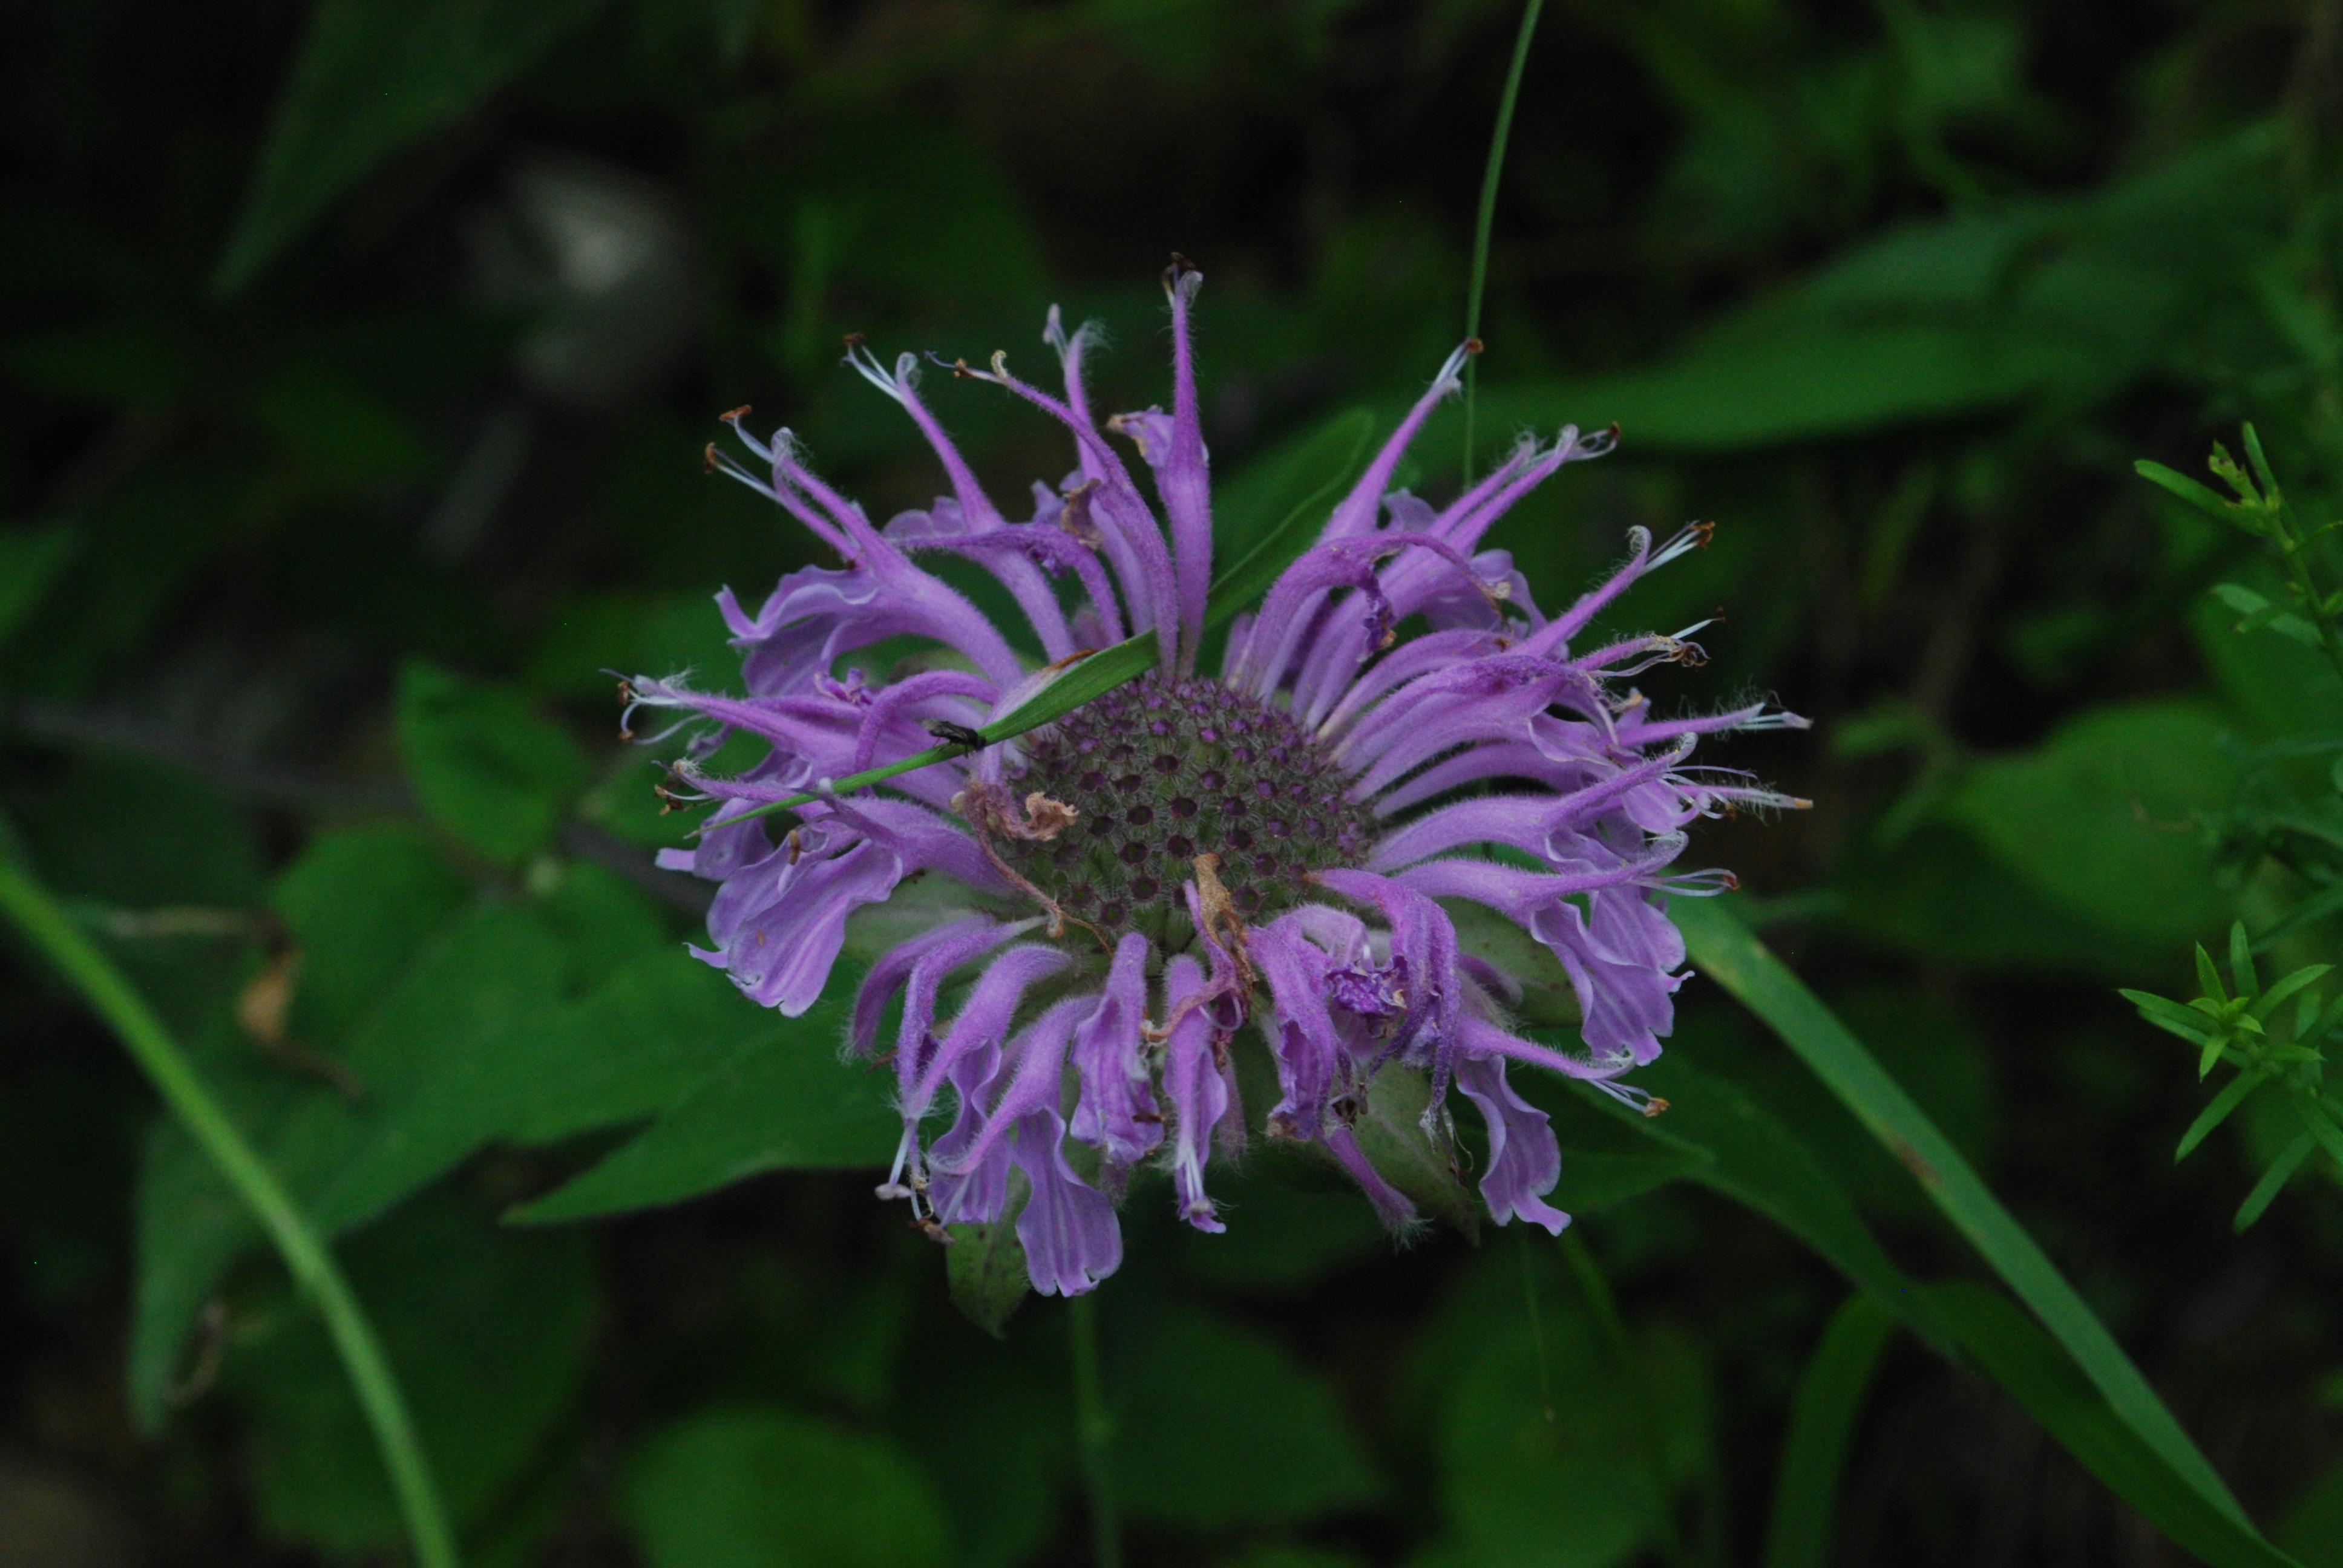 File:Wild Bergamot (Monarda fistulosa).jpg - Wikimedia Commons